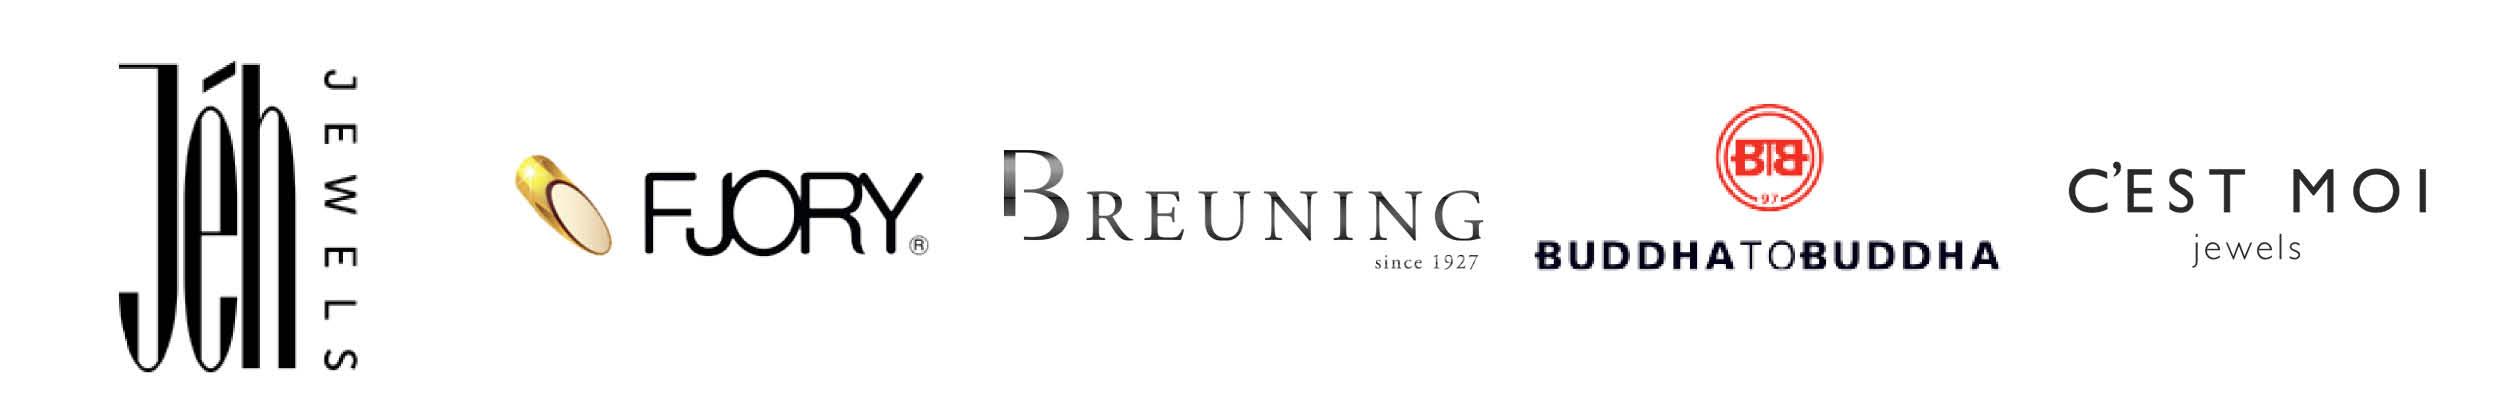 logo merken3